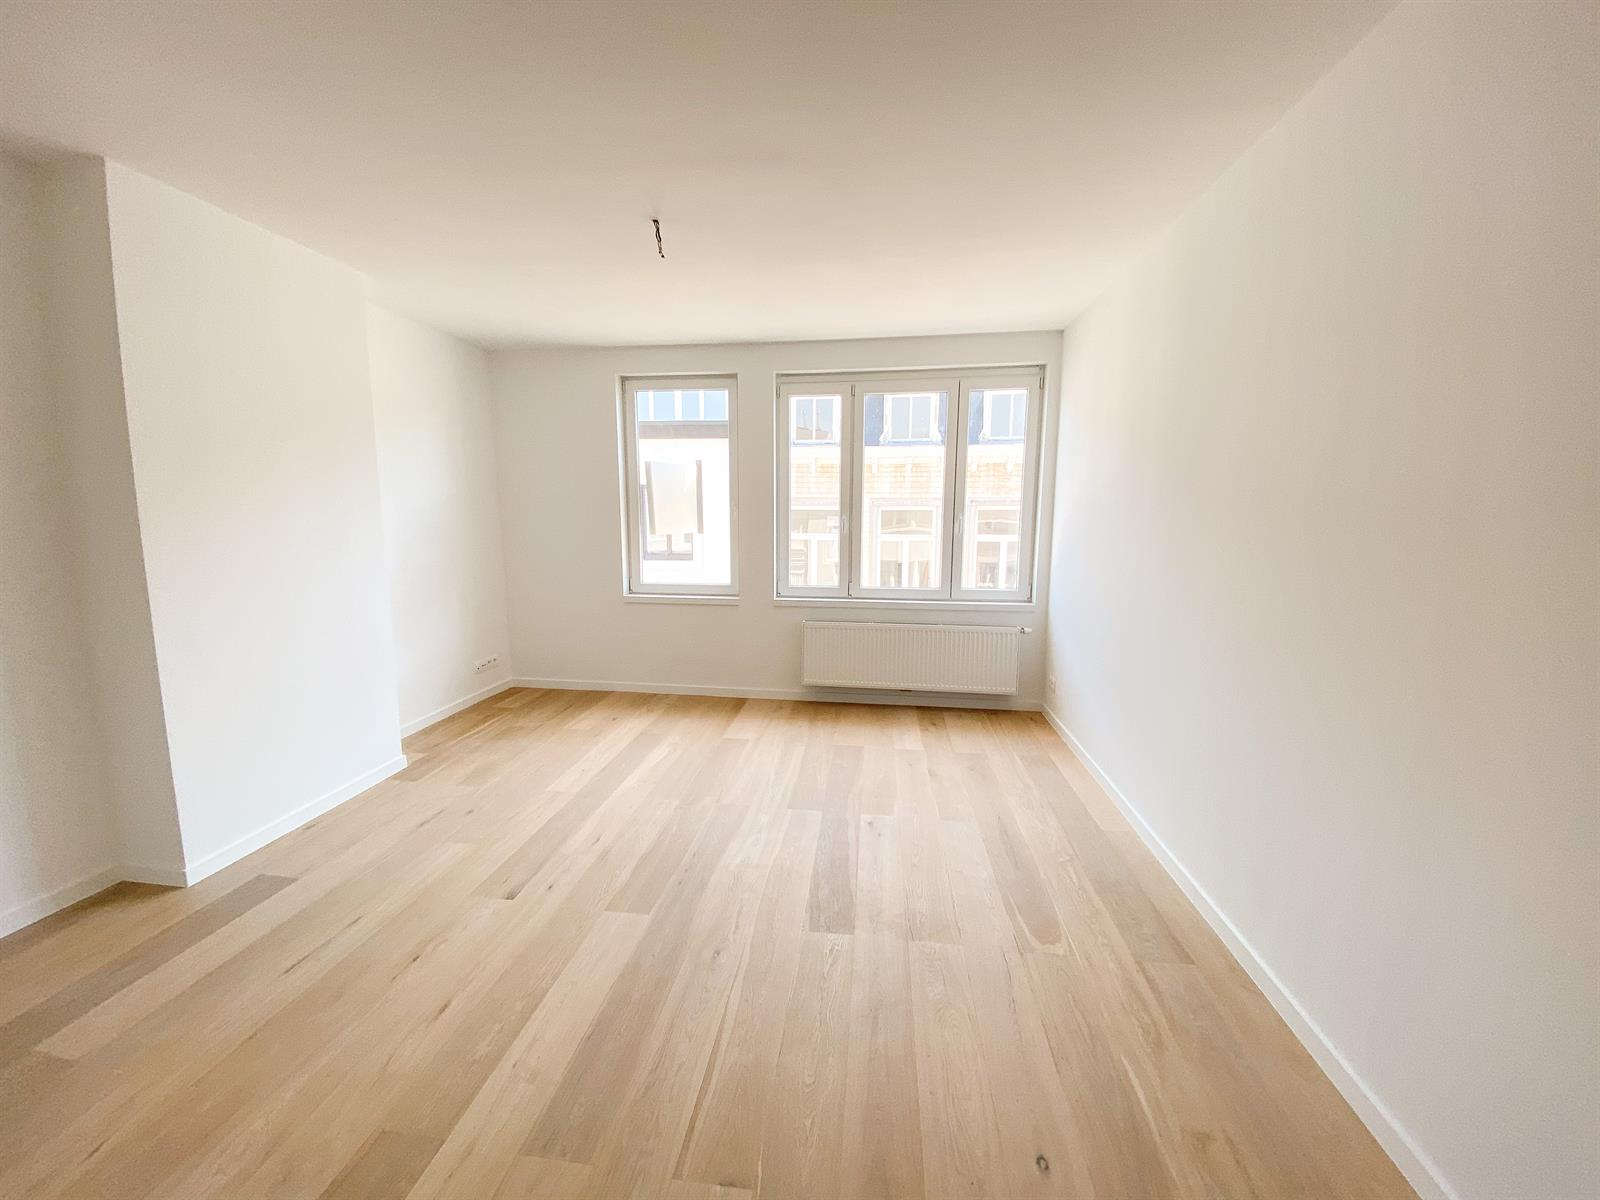 Appartement - Liège - #4045805-4